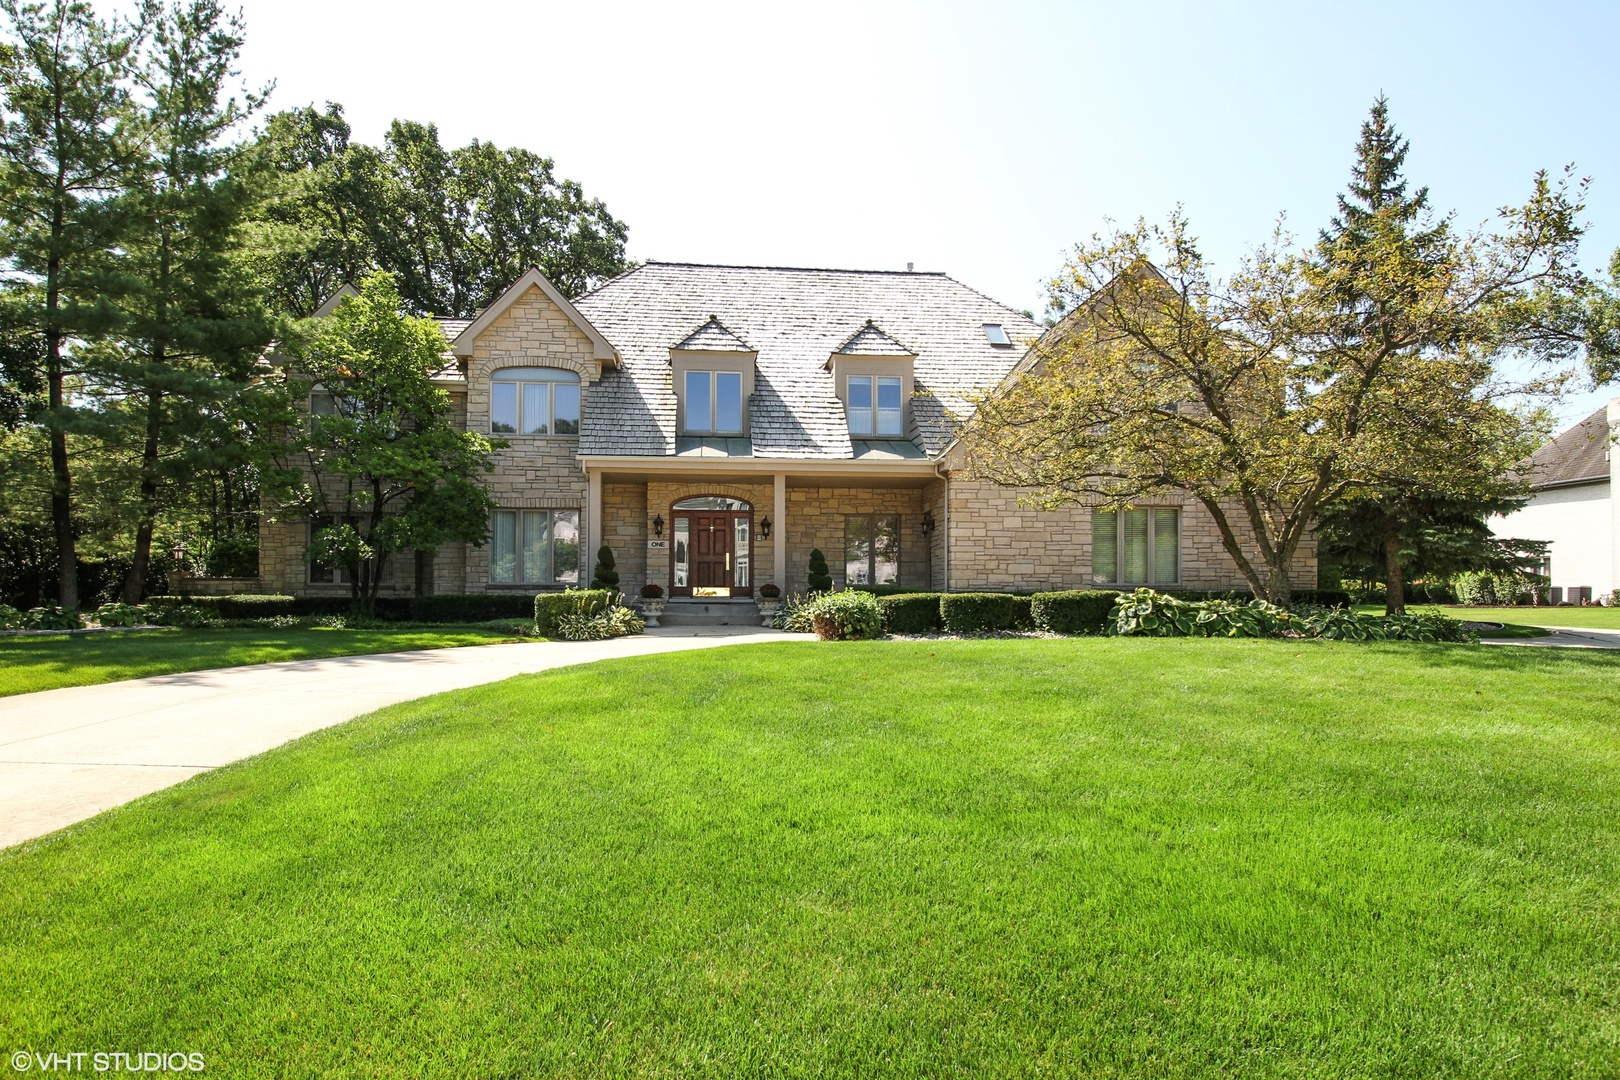 Residential Properties For Sale In Flossmoor Illinois